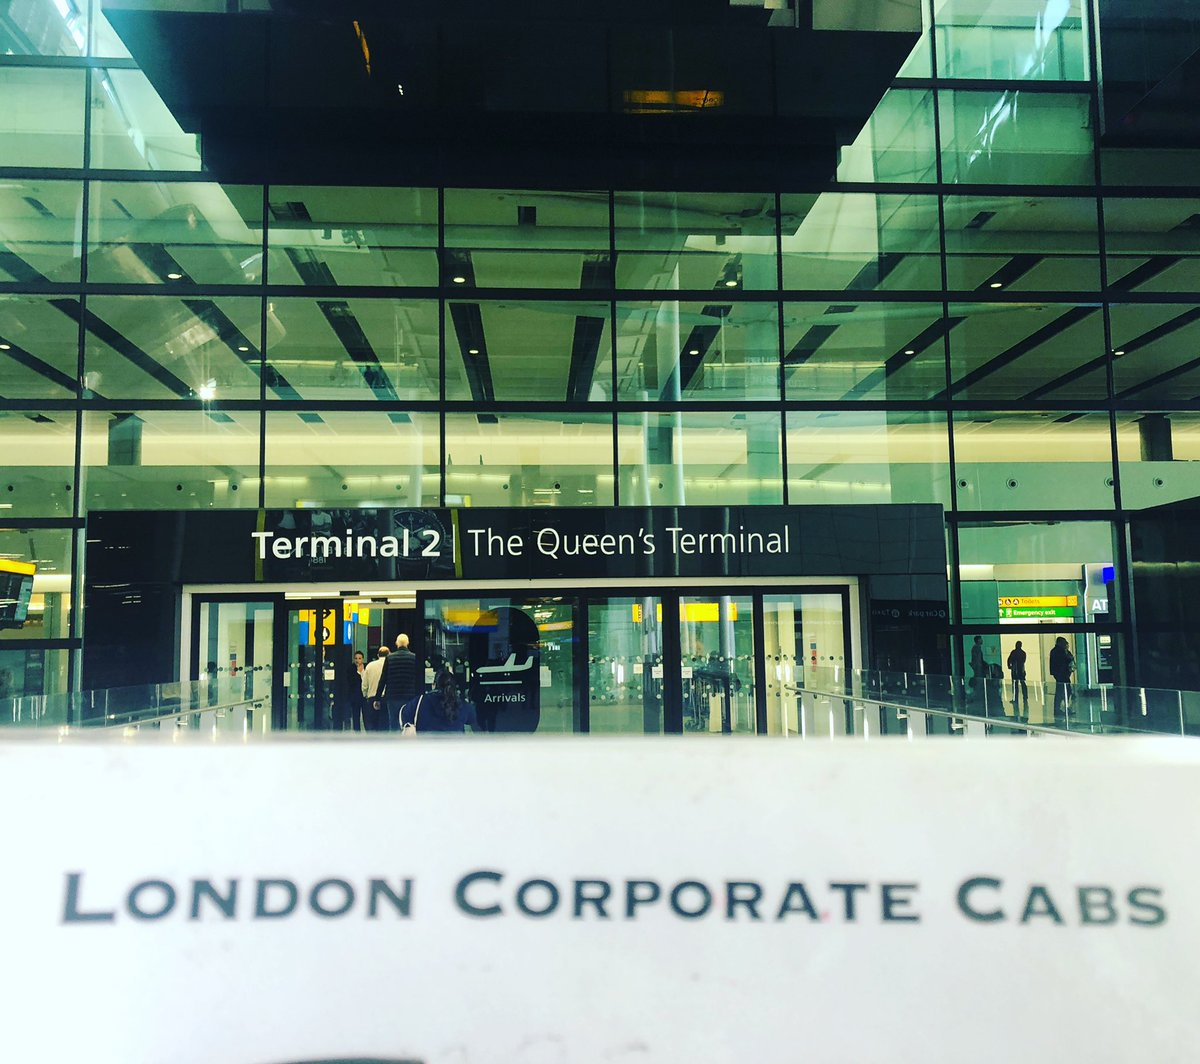 London Corporate Cabs Ldncorpcabs Twitter Profile Twipu